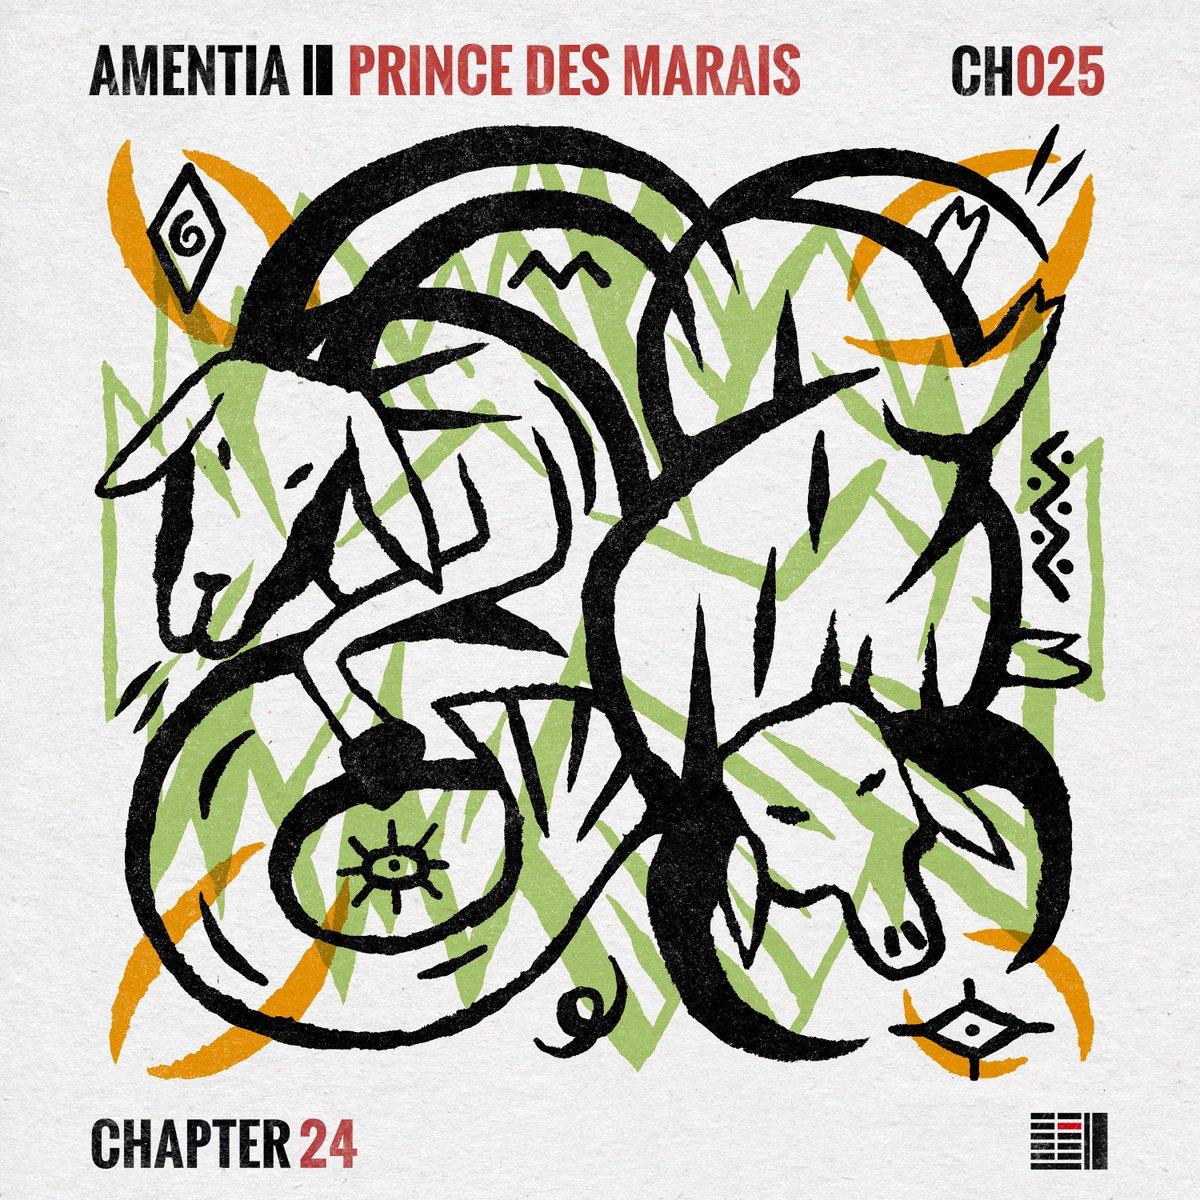 DA Premiere: Amentia – Prince Des Marais (John Monkman Edition)  http:// cur.lv/14s13n  &nbsp;   #Music #ProgressiveHouse #TechHouse #EDM<br>http://pic.twitter.com/rChjJkfckM